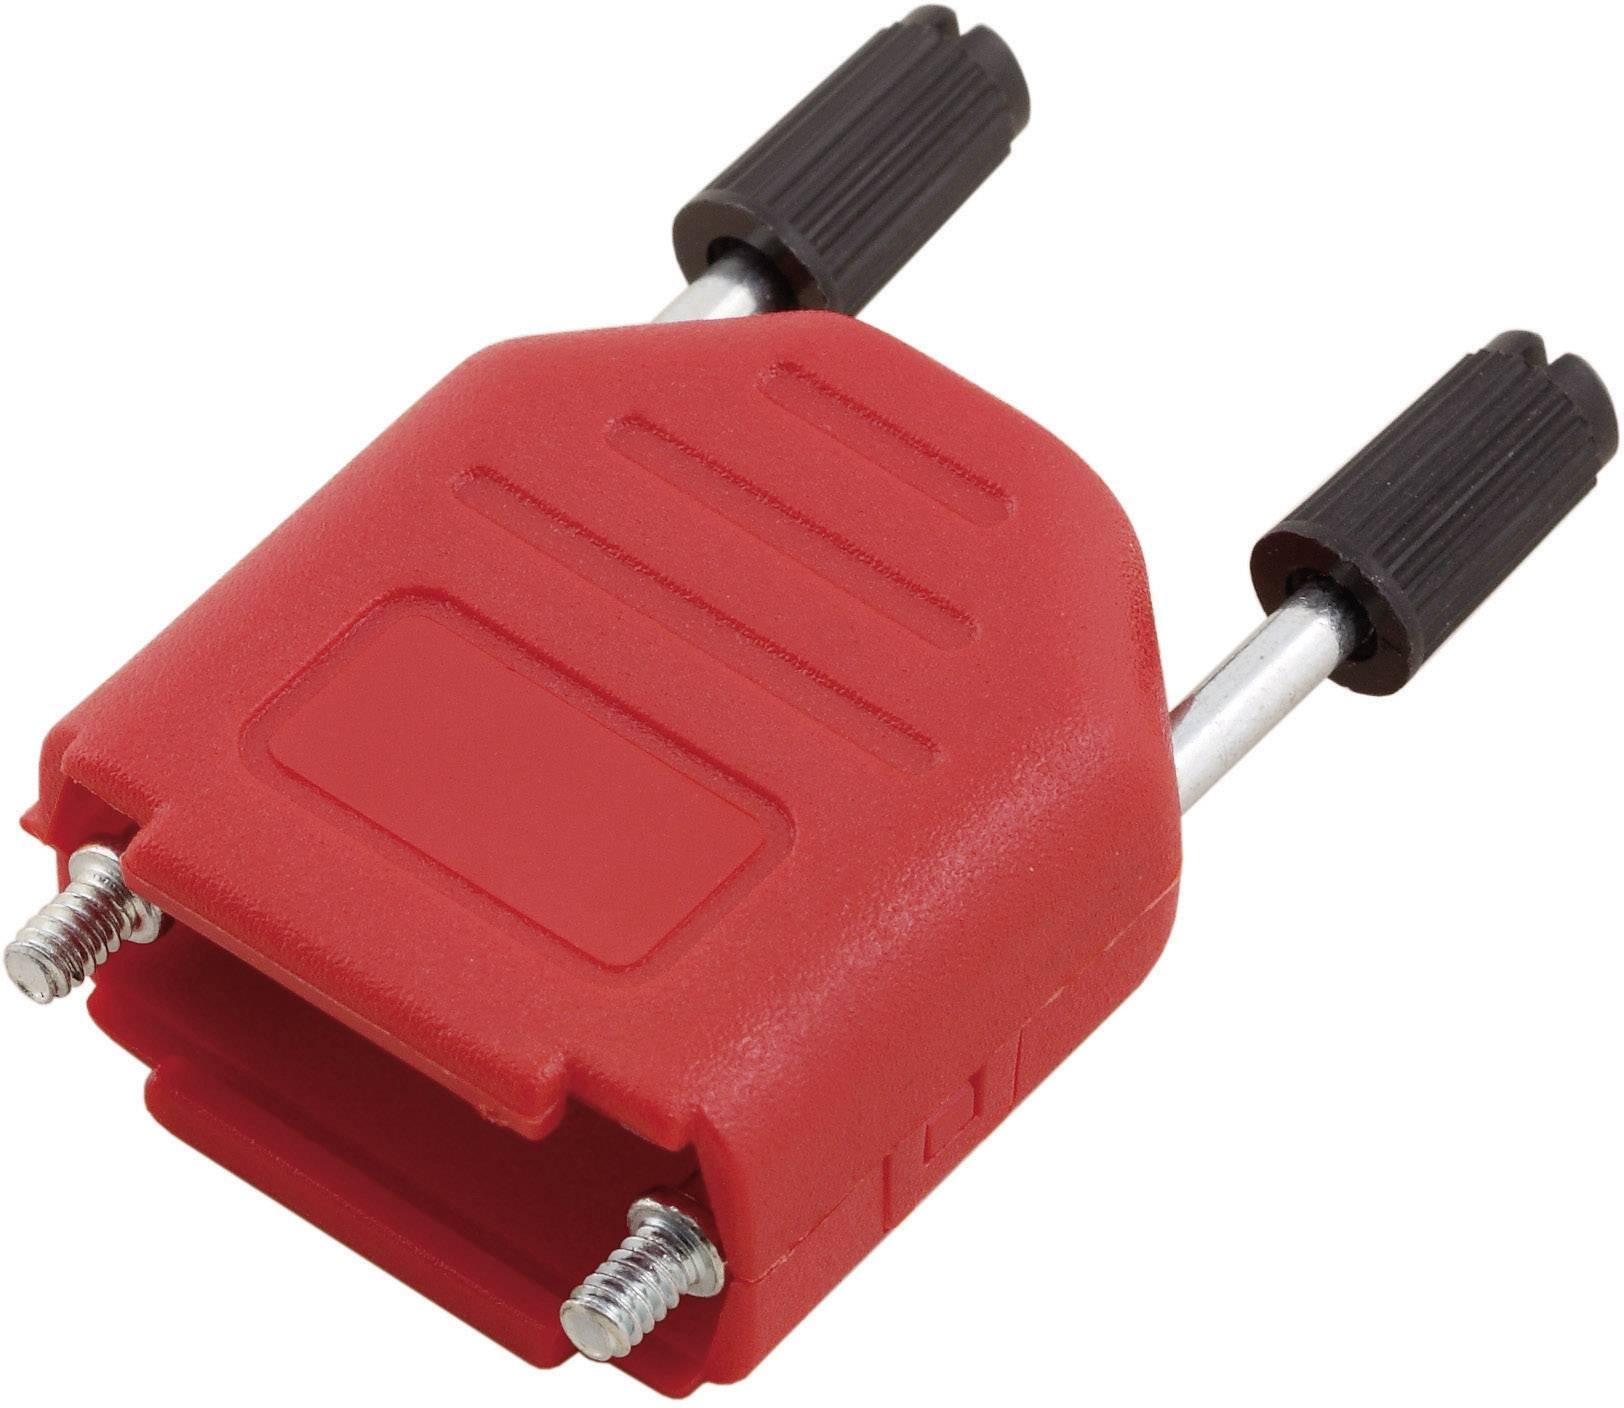 D-SUB pouzdro MH Connectors MHDPPK25-R-K, Pólů: 25, plast, 180 °, červená, 1 ks